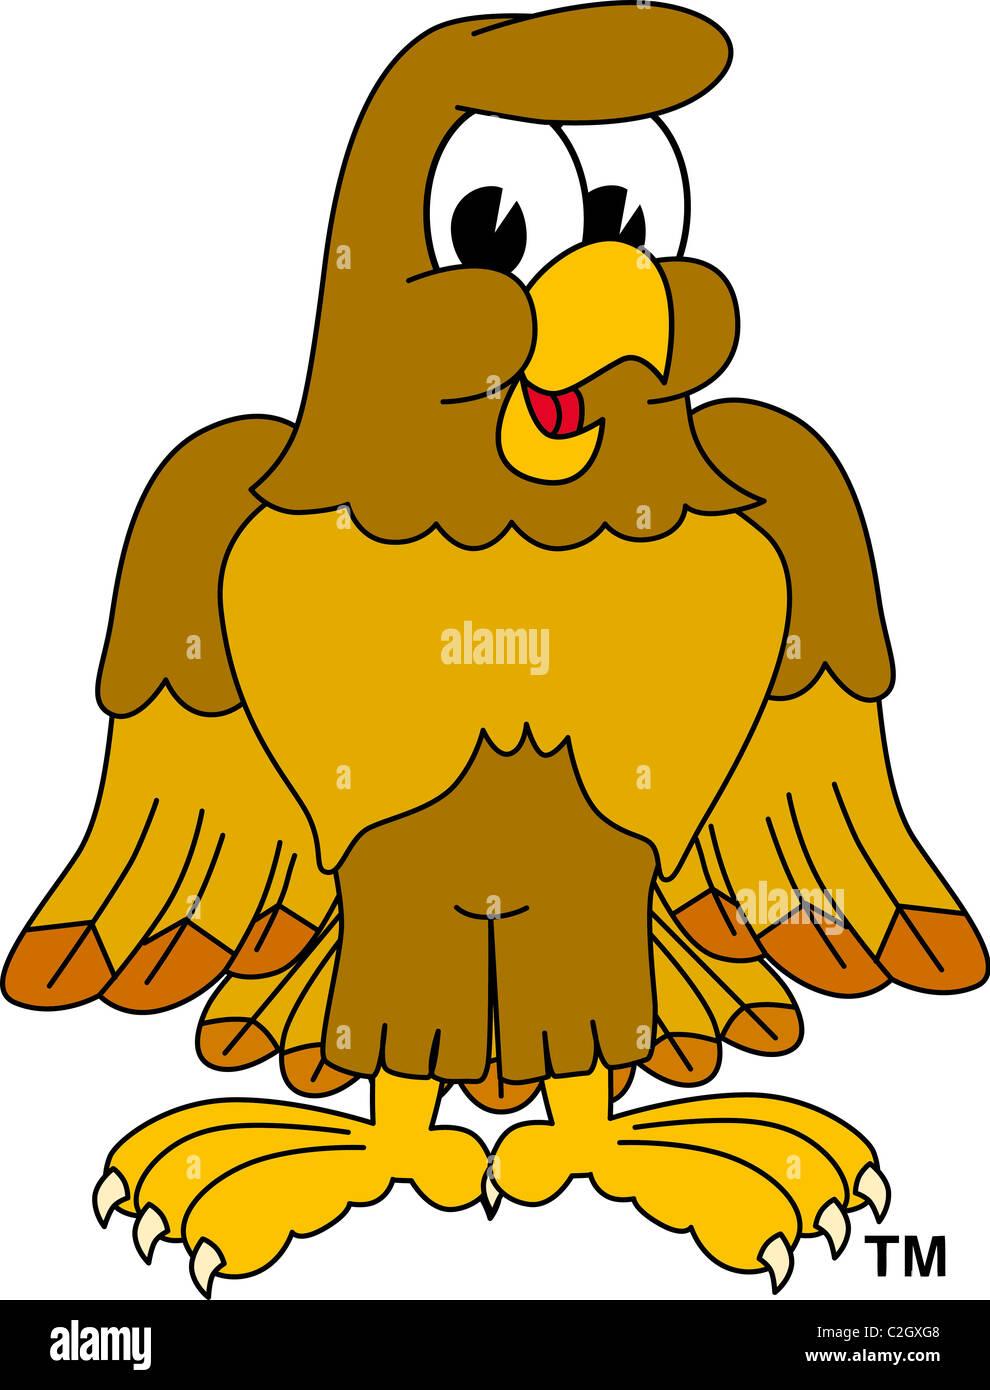 hight resolution of cartoon hawk eagle or falcon mascot clip art